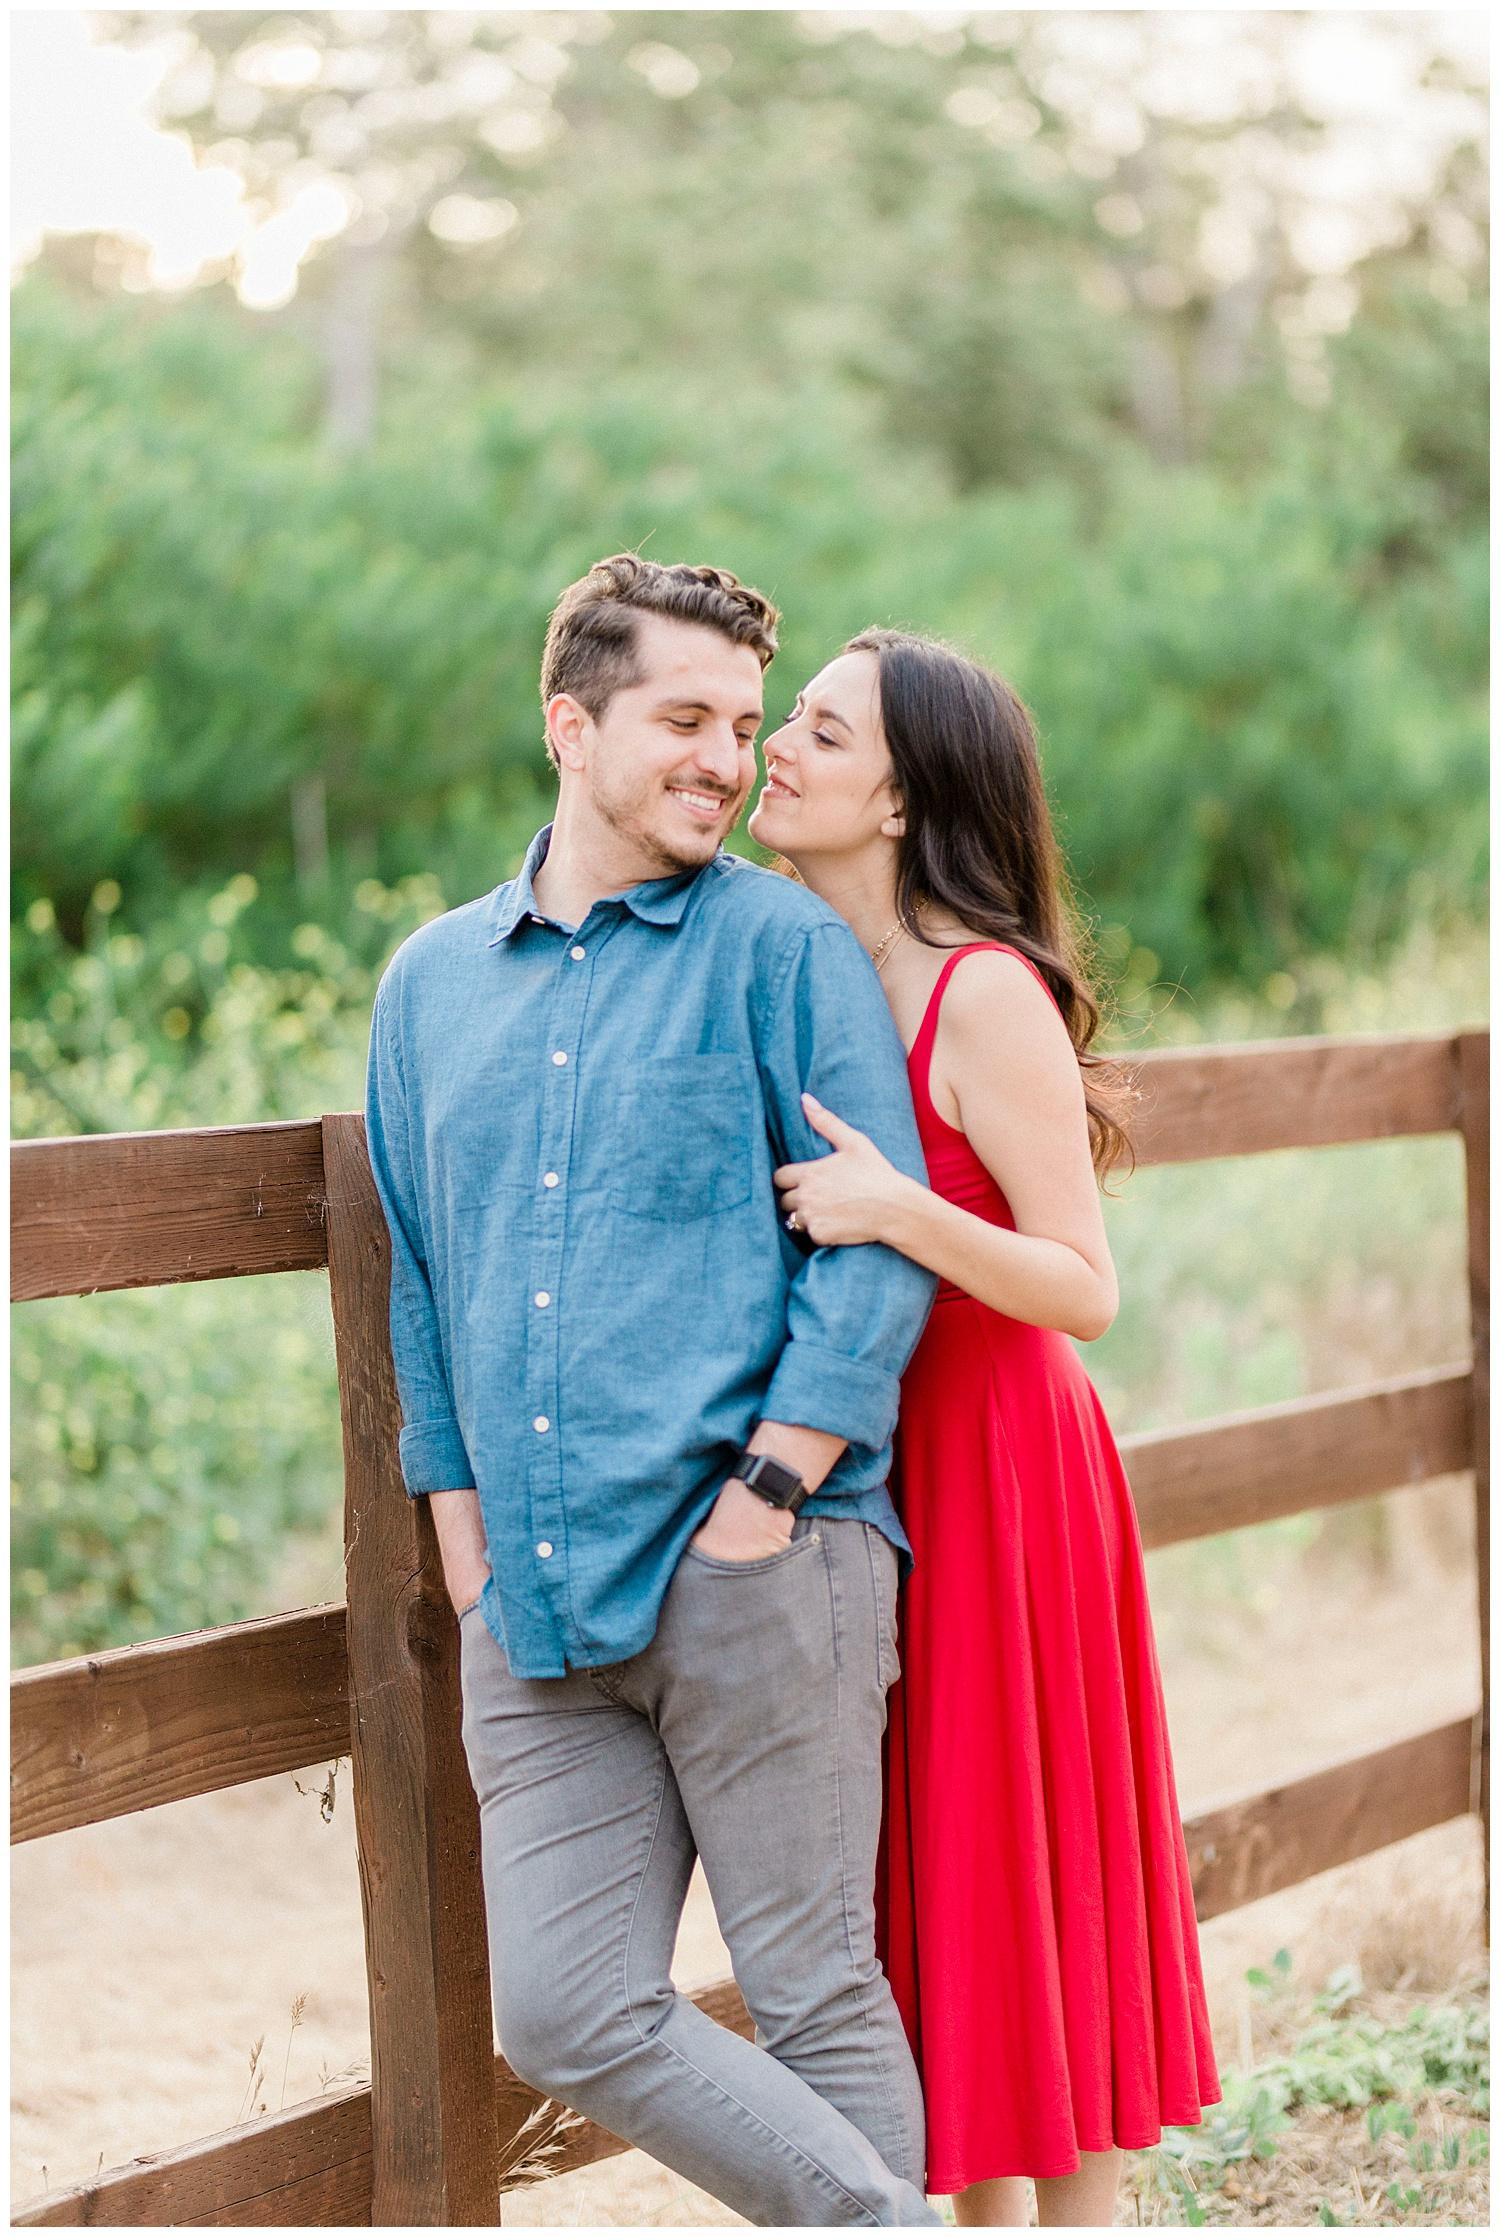 rancho-santa-fe-engagement-photographer.jpg